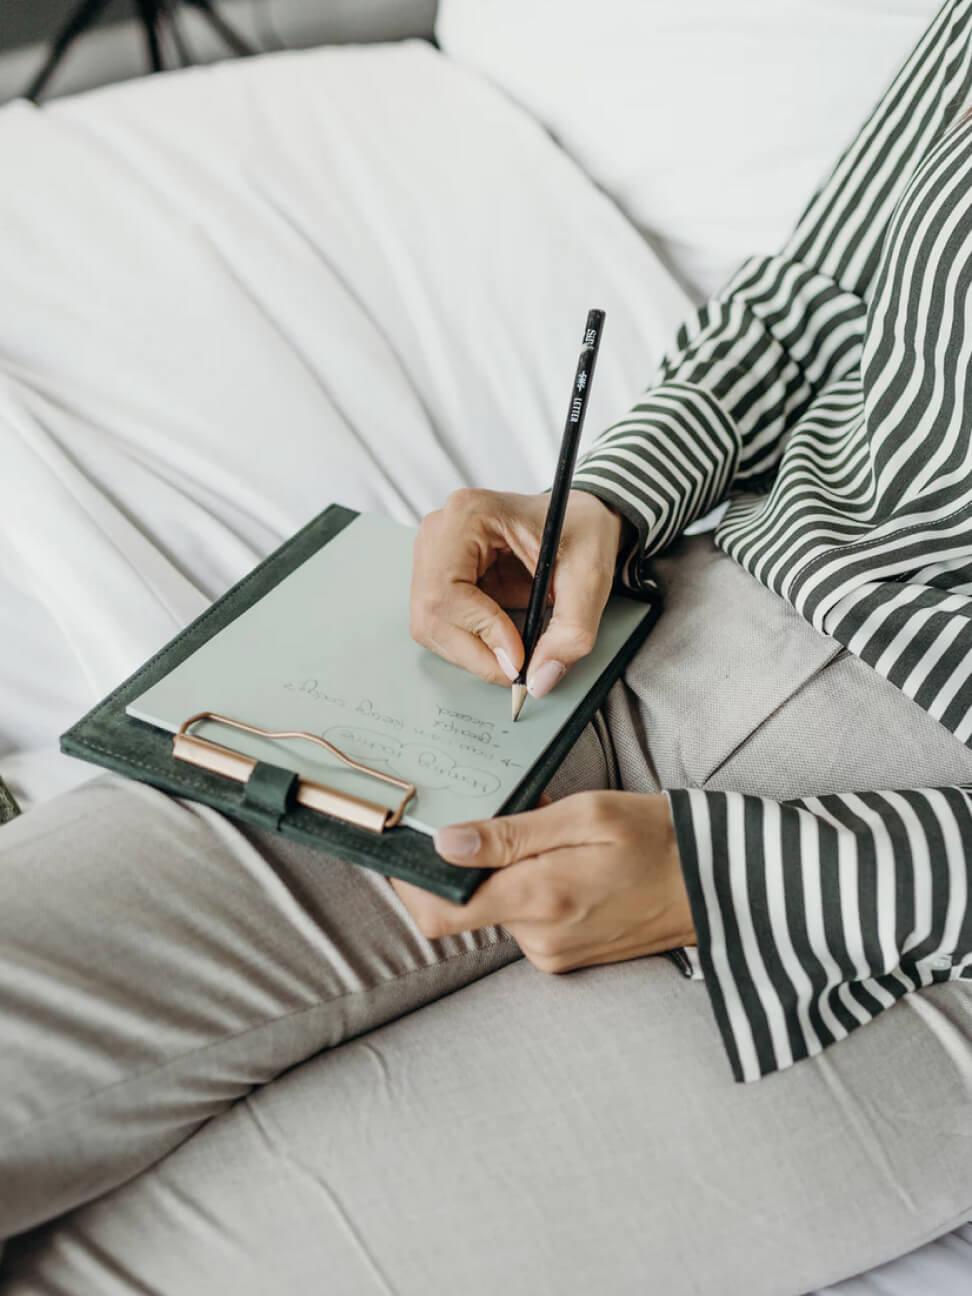 A women writing her Marketing plan, utilizing marketing strategies and tactics.